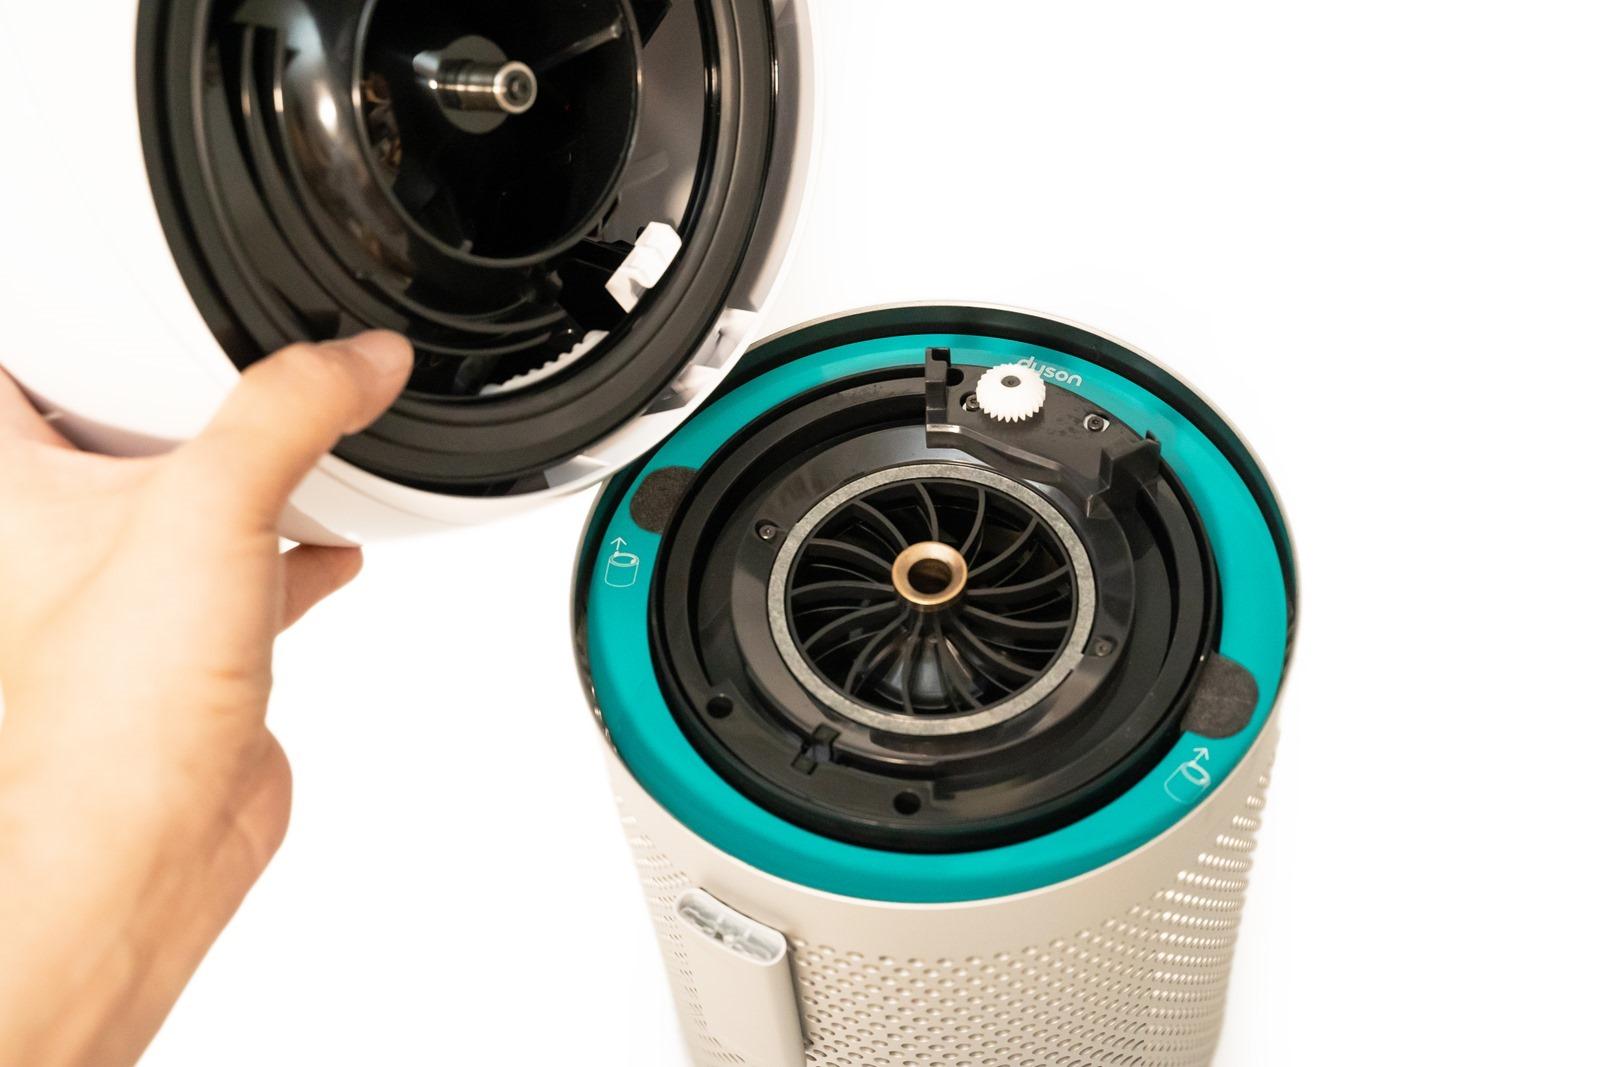 Dyson 再次震撼市場,Dyson Pure Cool Me™ 全新科技,讓你清淨涼爽整個夏天 @3C 達人廖阿輝